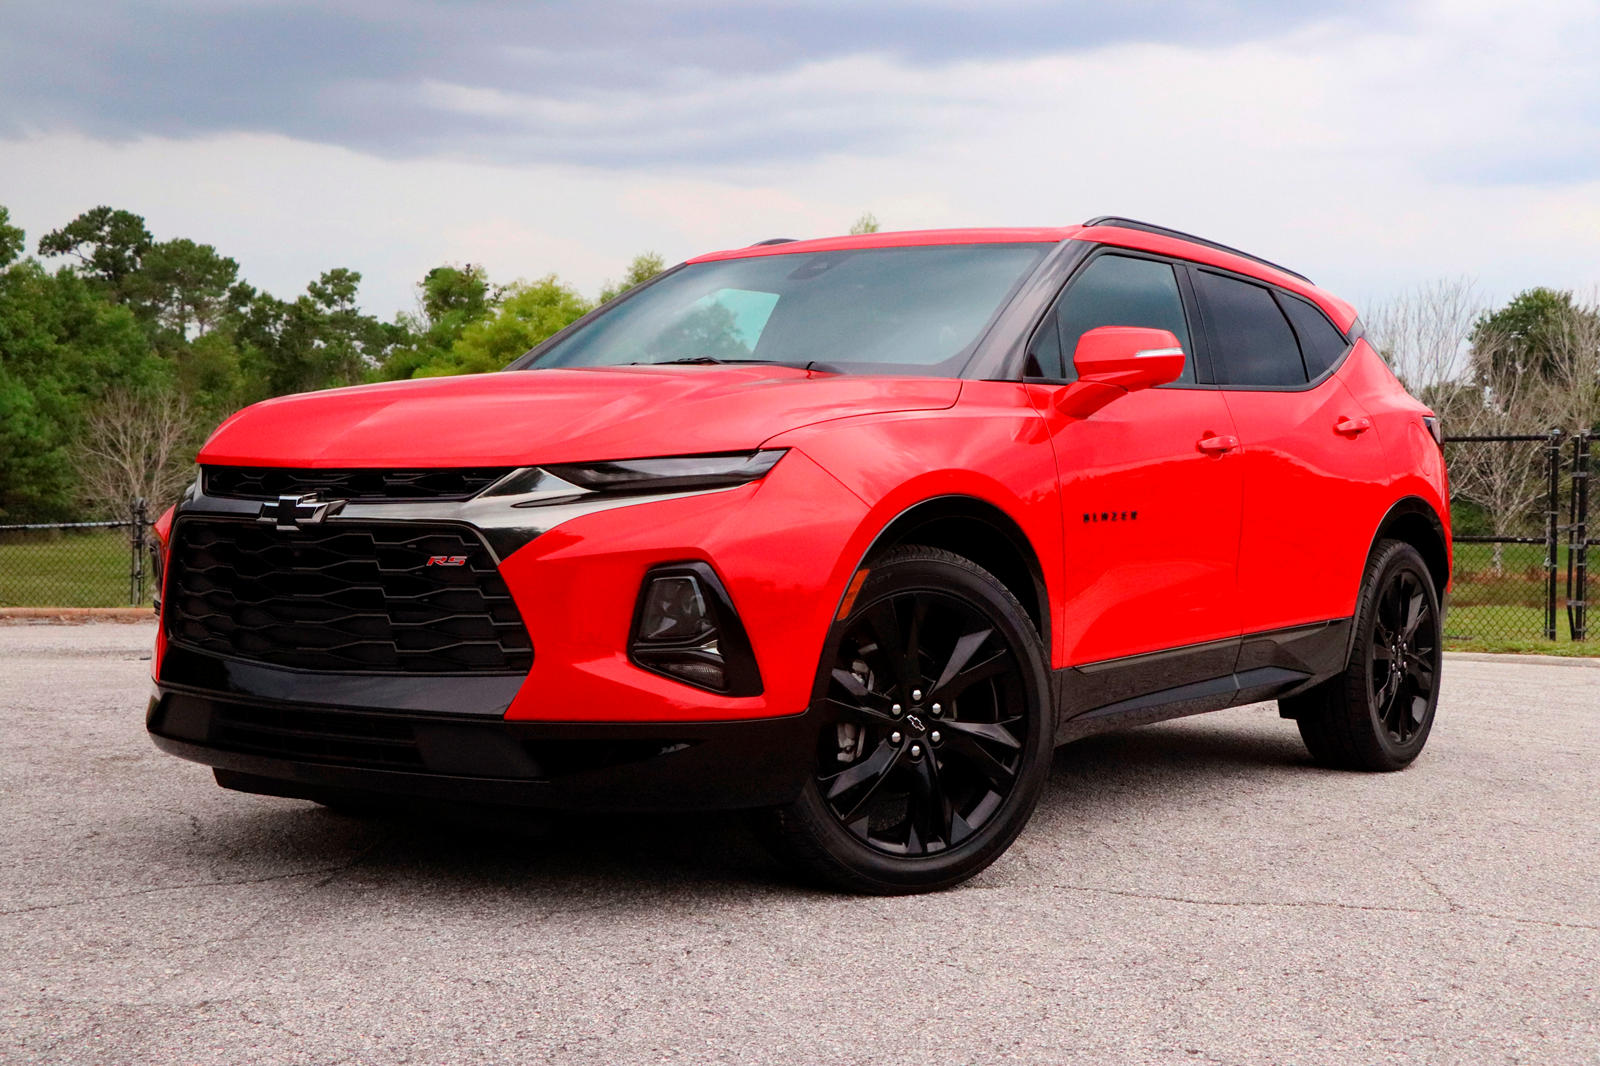 2020 Chevrolet Blazer Review, Trims, Specs and Price | CarBuzz